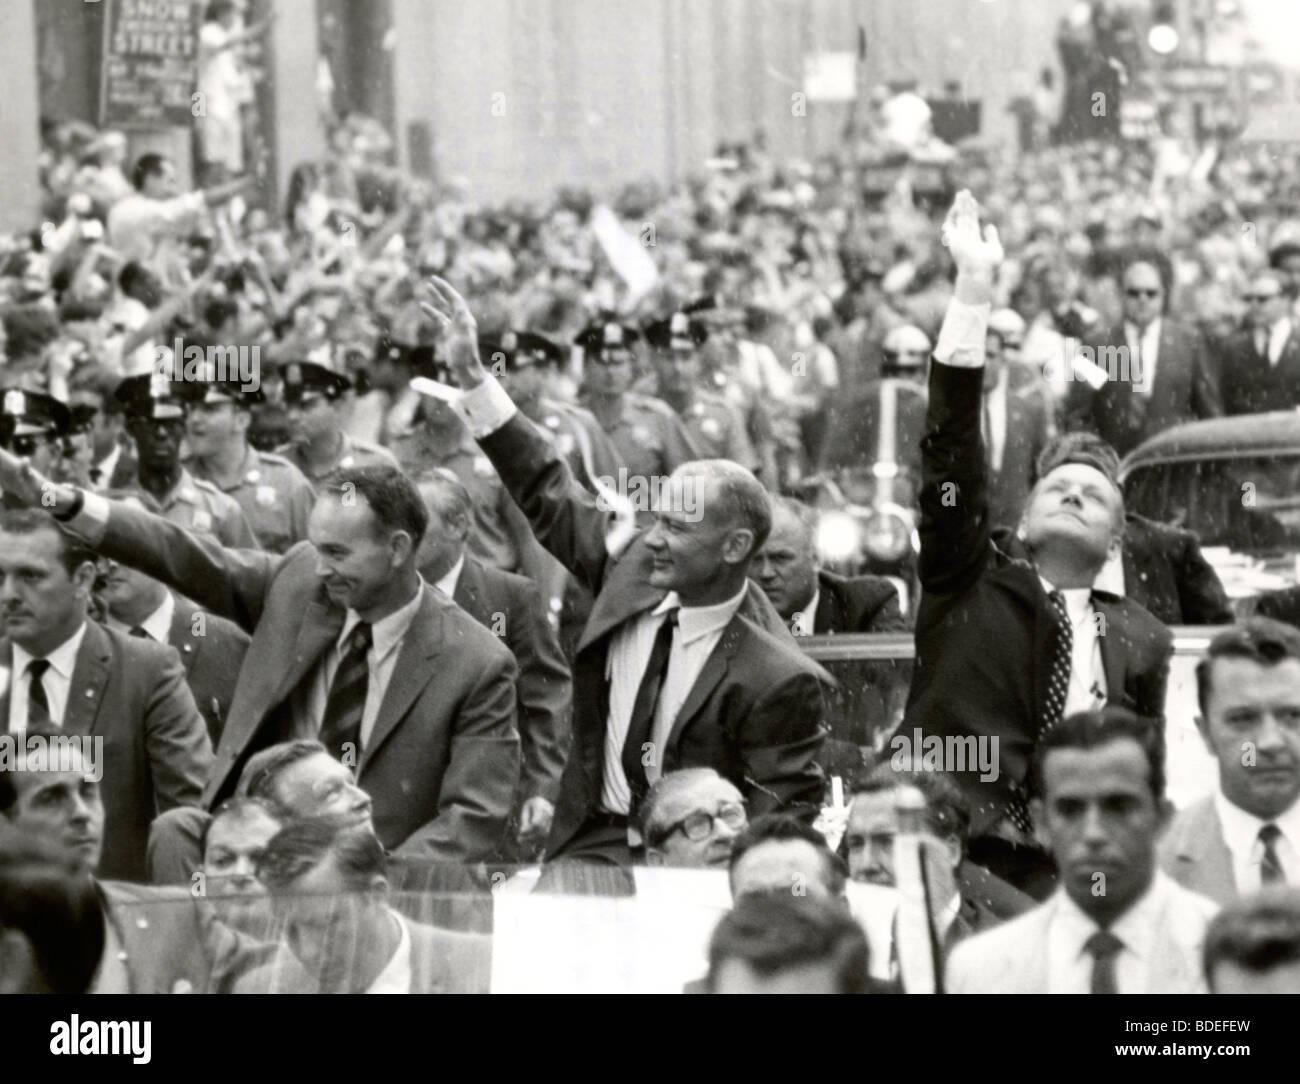 New York City Welcomes the Apollo 11 Astronauts - Stock Image